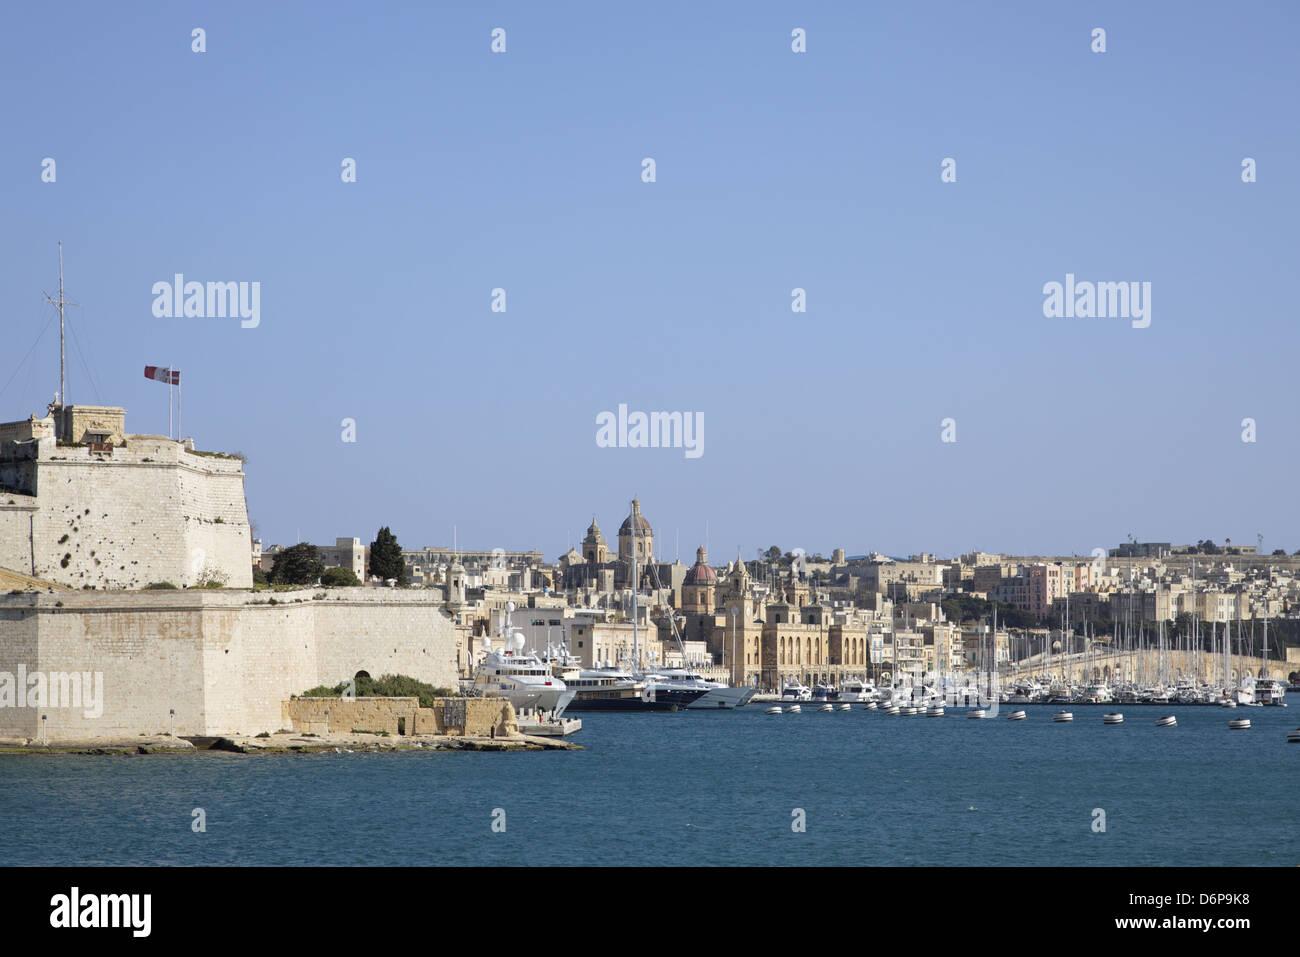 Malta, Valletta, UNESCO, view on the Grand Harbour peaceful, harmonious, Malta, Valletta, UNESCO Welterbe, Blick - Stock Image